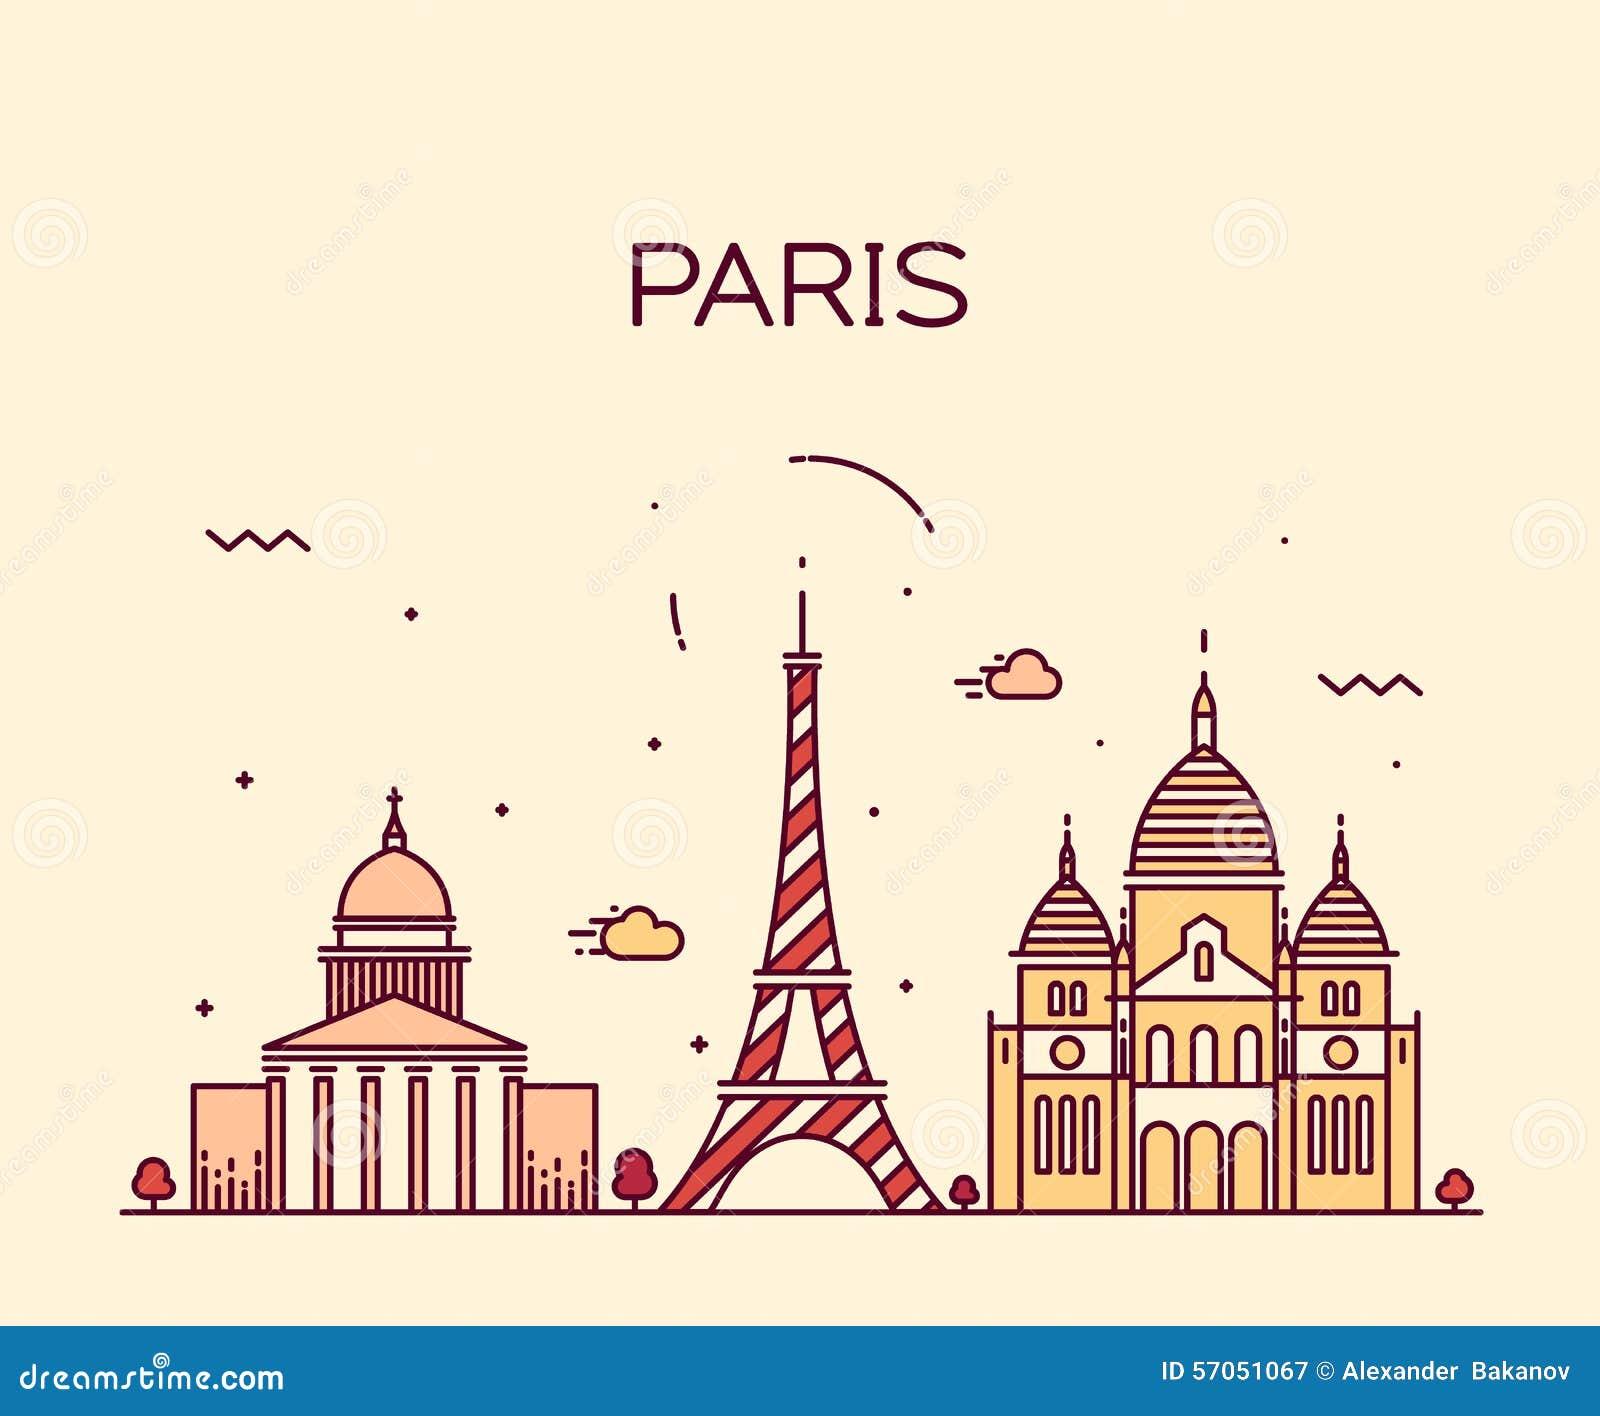 Paris Illustration: Vector Paris Silhouette Skyline Cartoon Vector